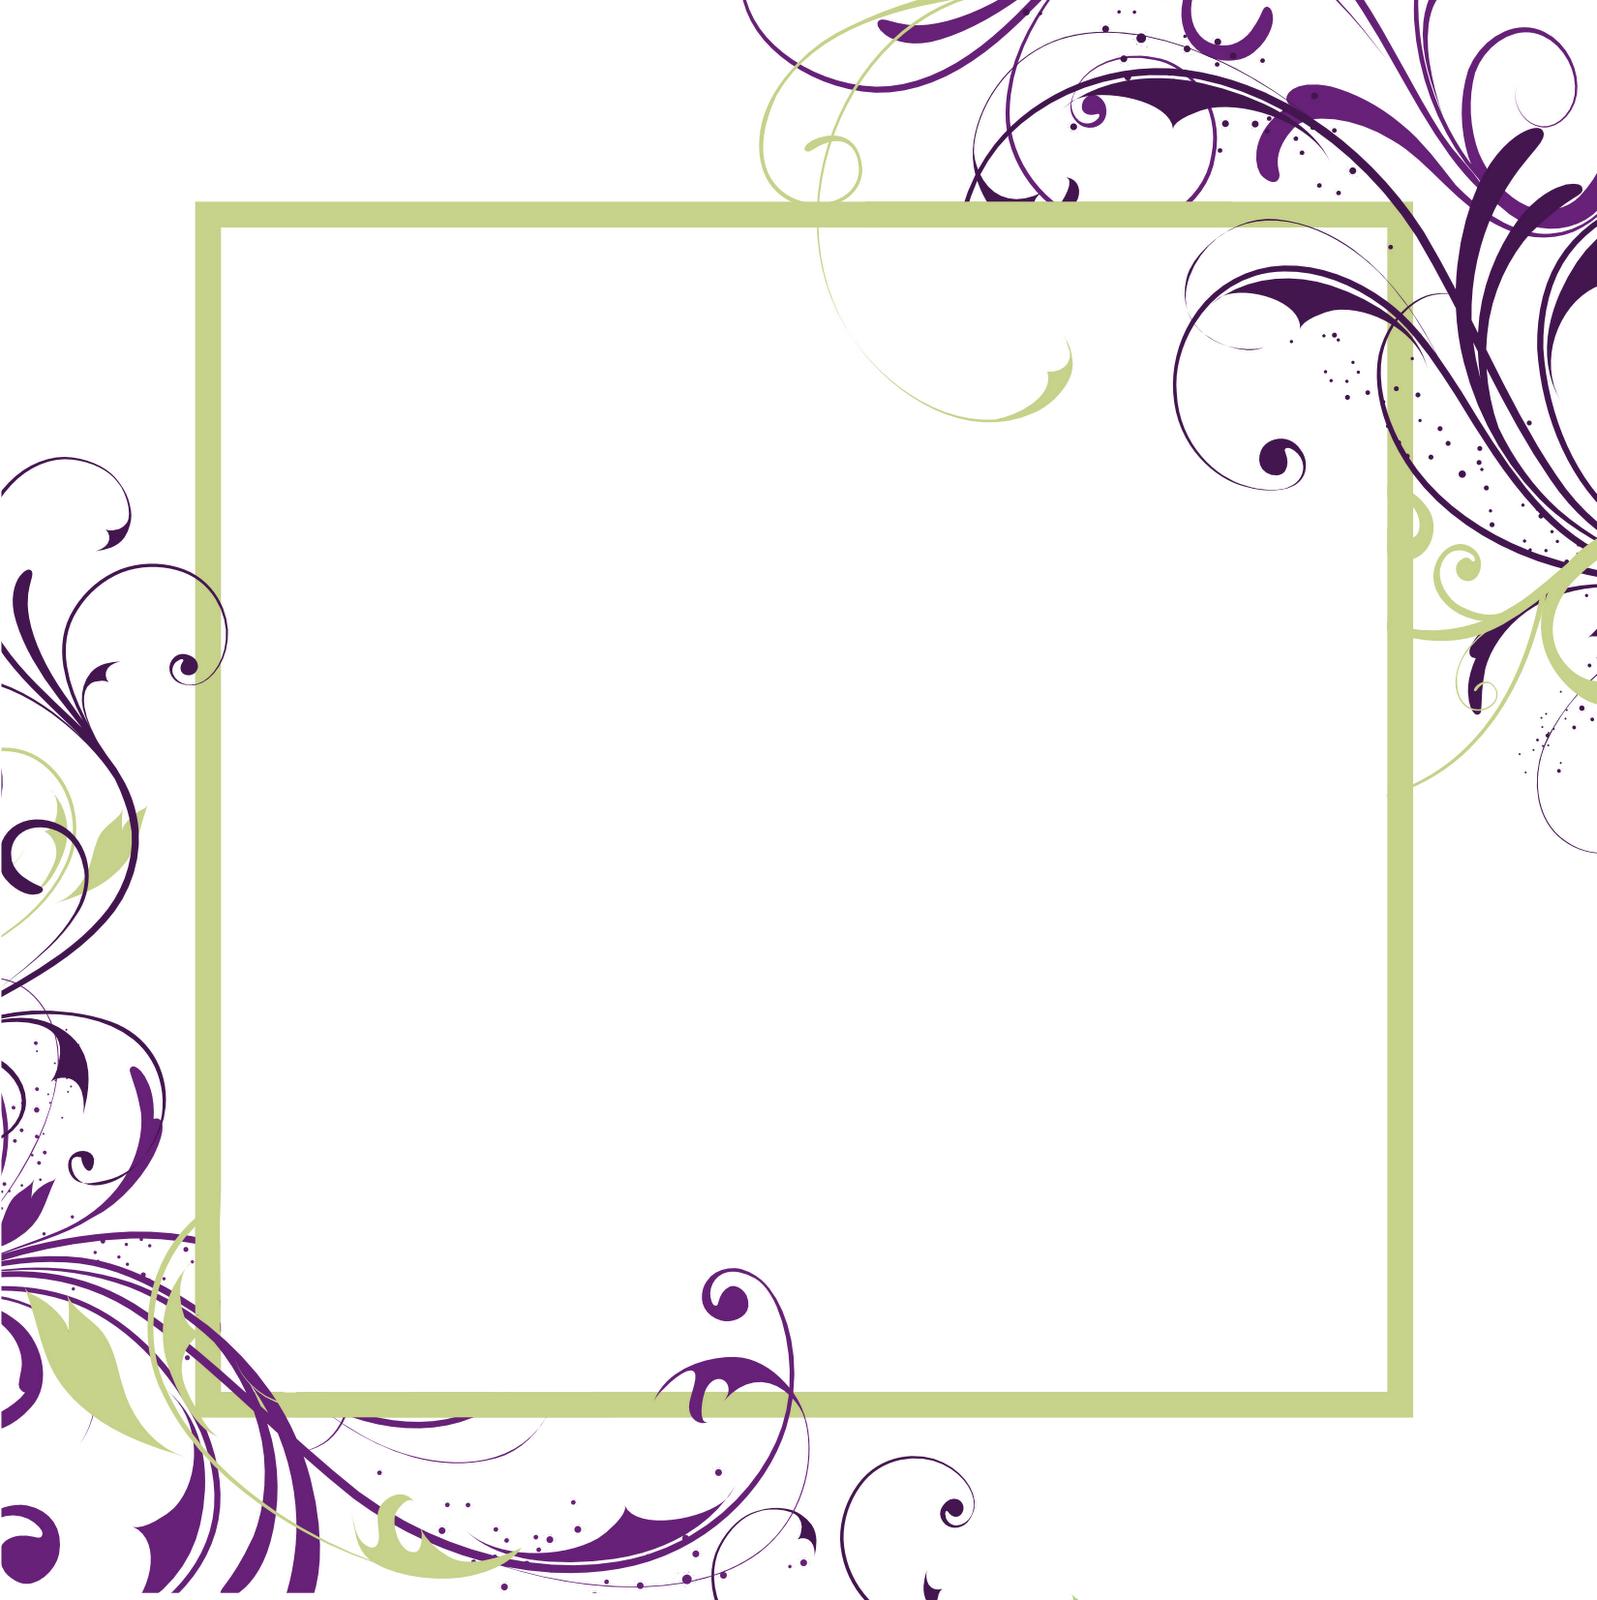 74 Adding Blank Wedding Invitation Template in Photoshop with Blank Wedding Invitation Template